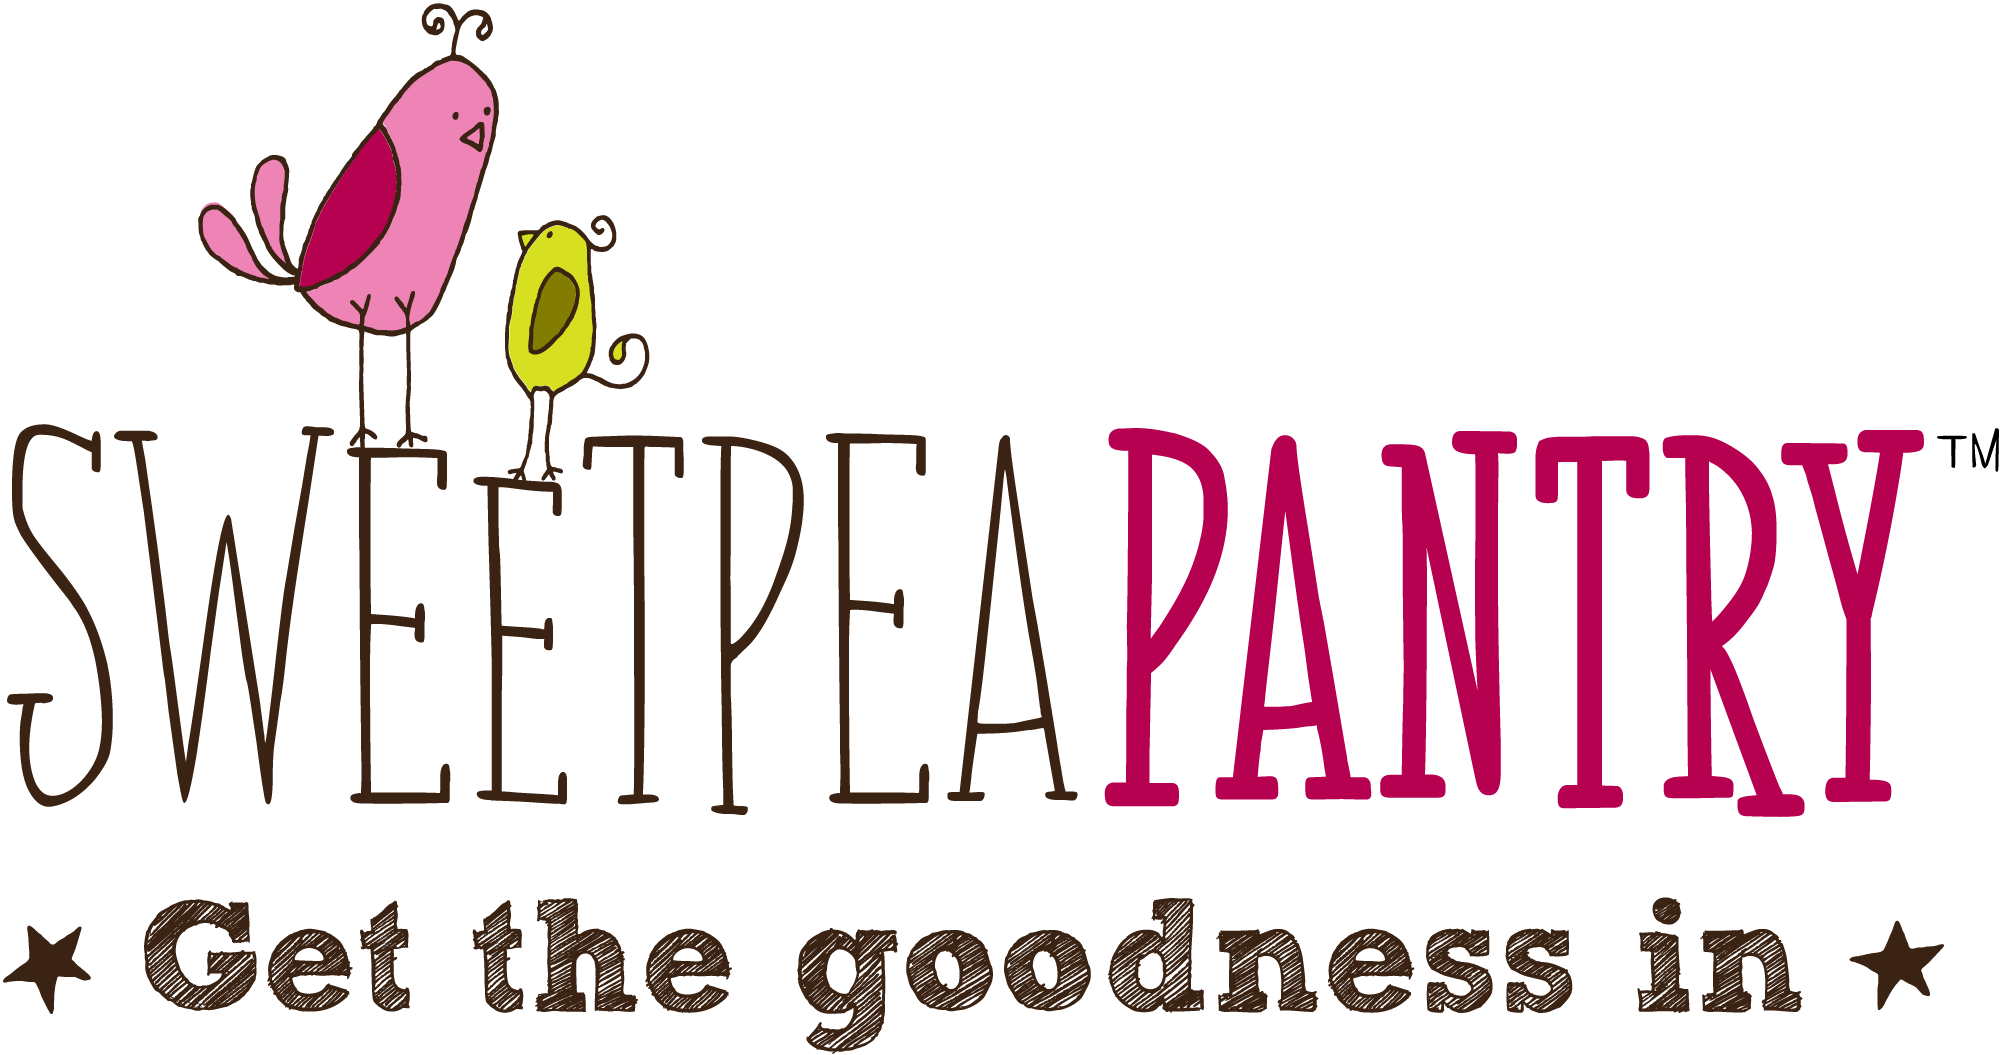 sweetie pantry logo